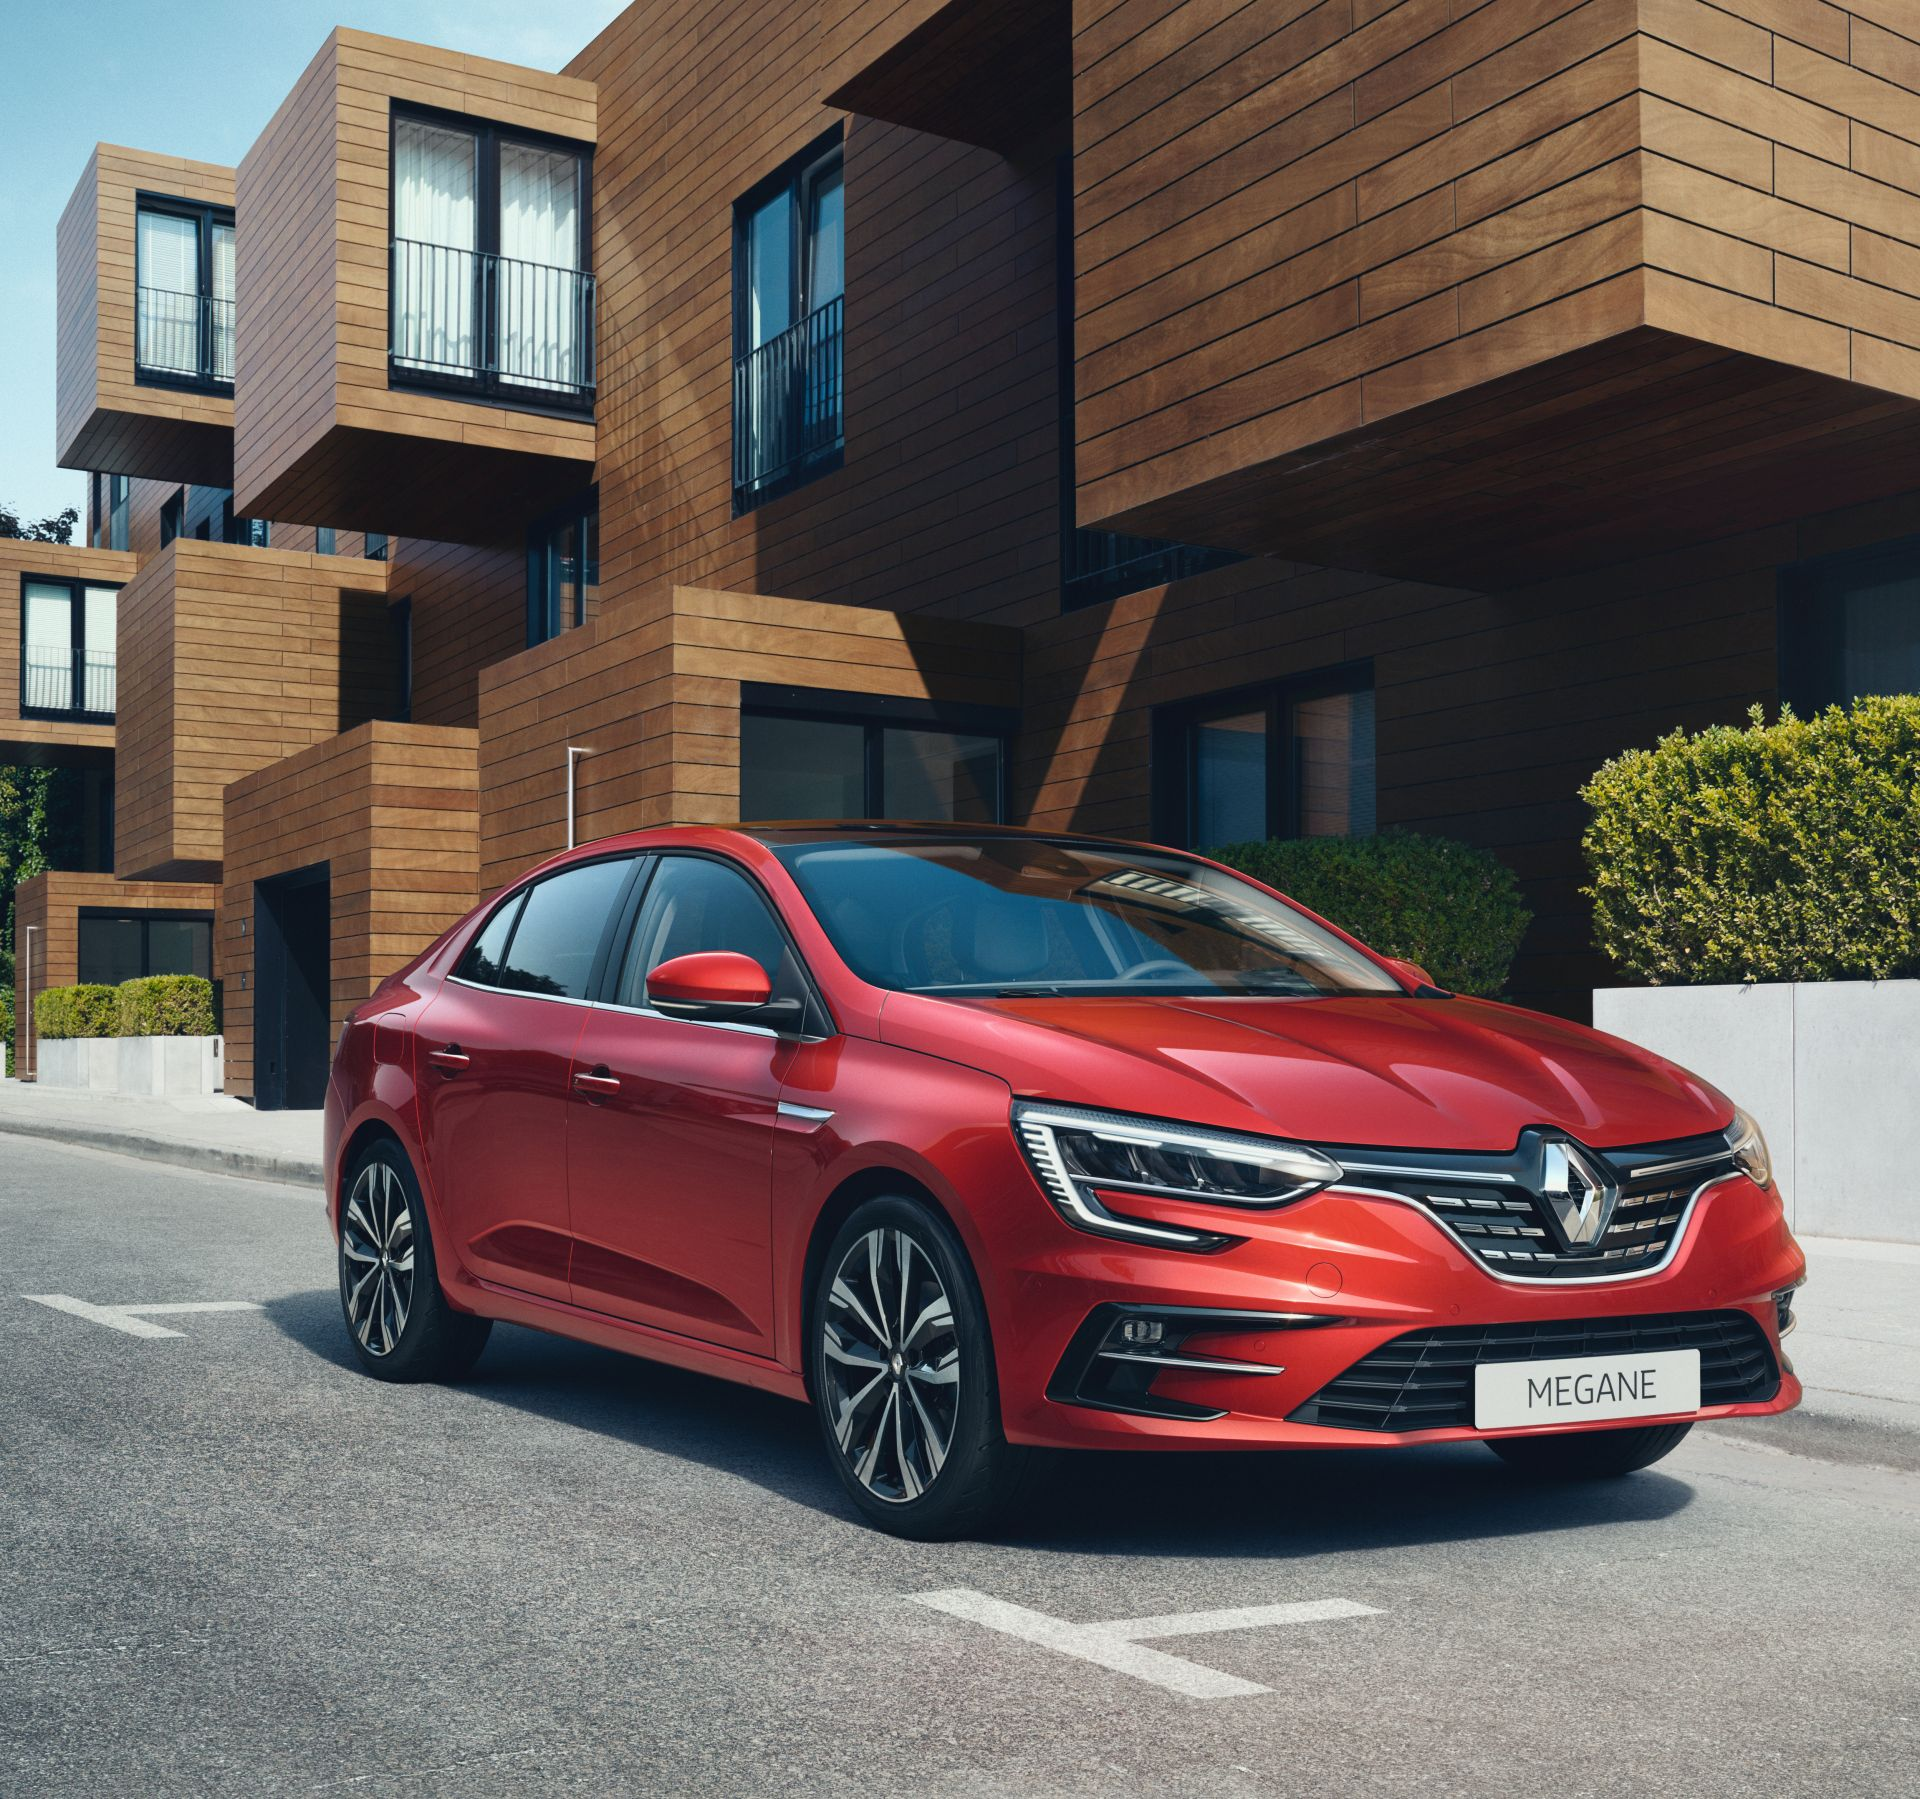 2021 Renault Megane Sedan Facelift 5